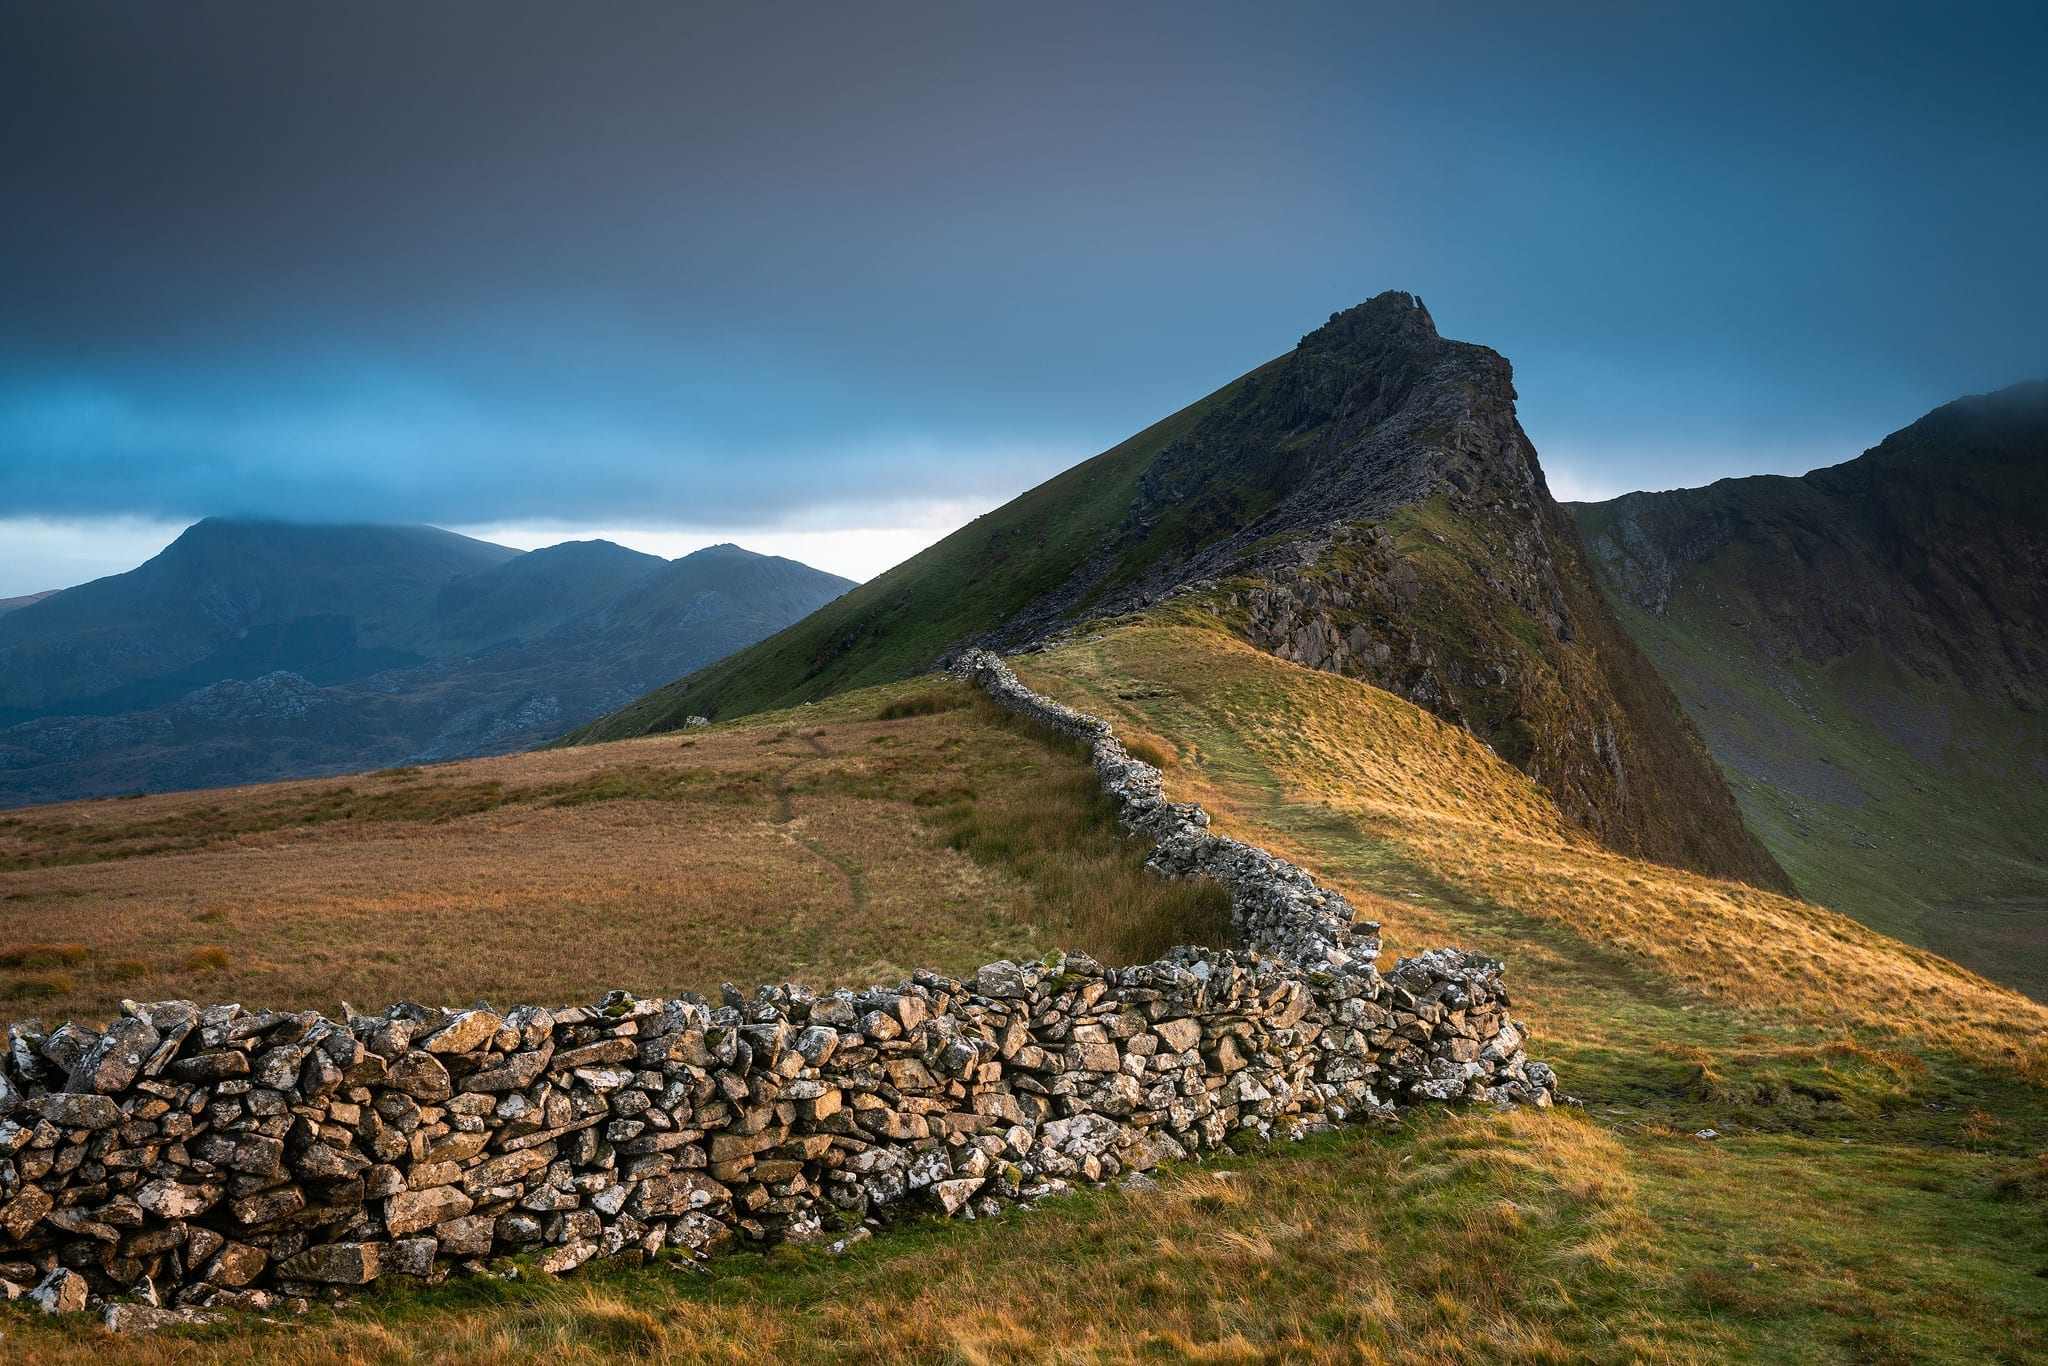 Nantlle Ridge Sunset - Snowdonia Landscape Photography